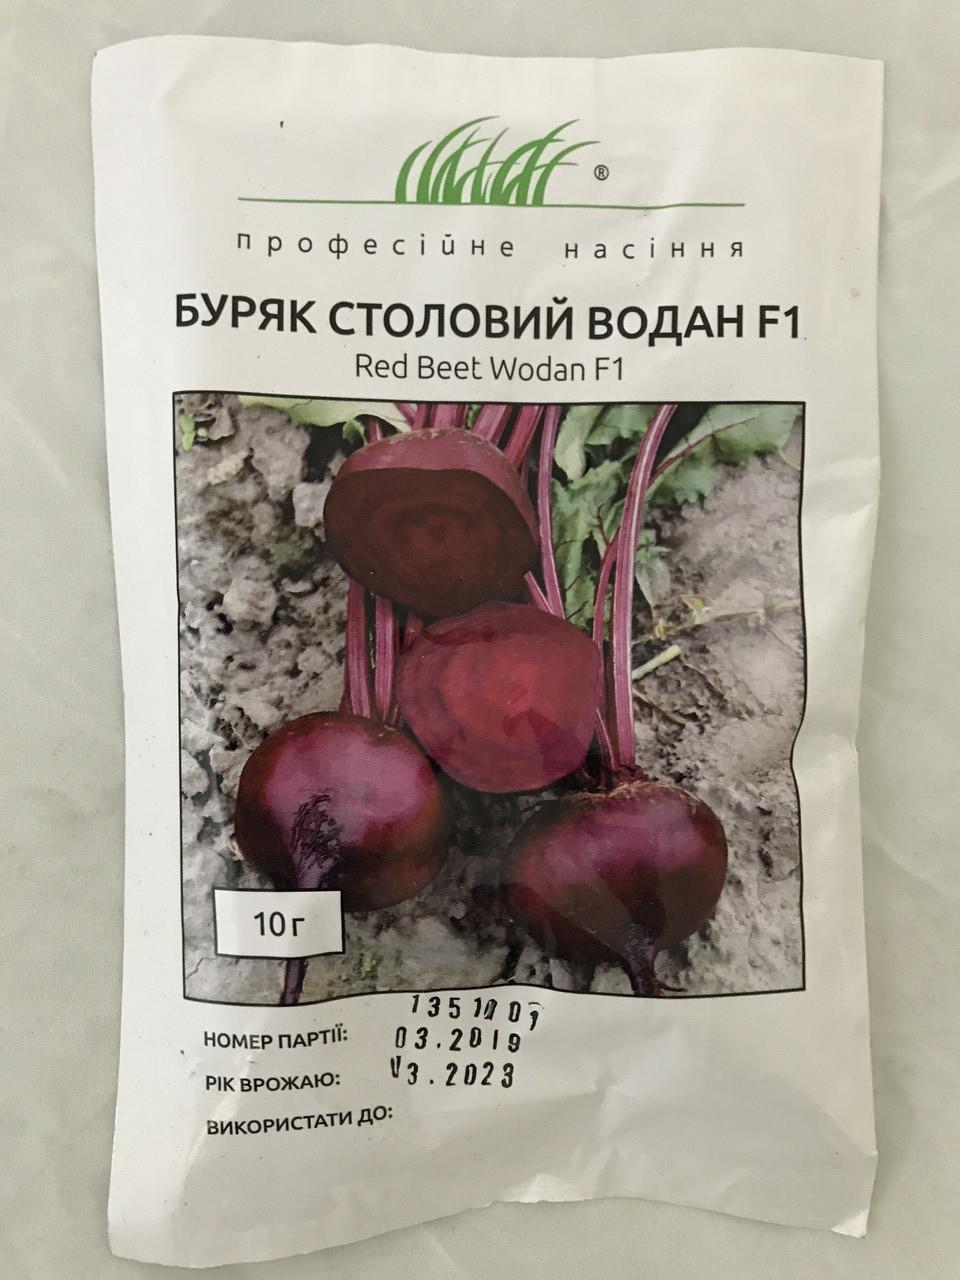 Семена буряка Водан F1 10 гр. Профессиональные семена 123517